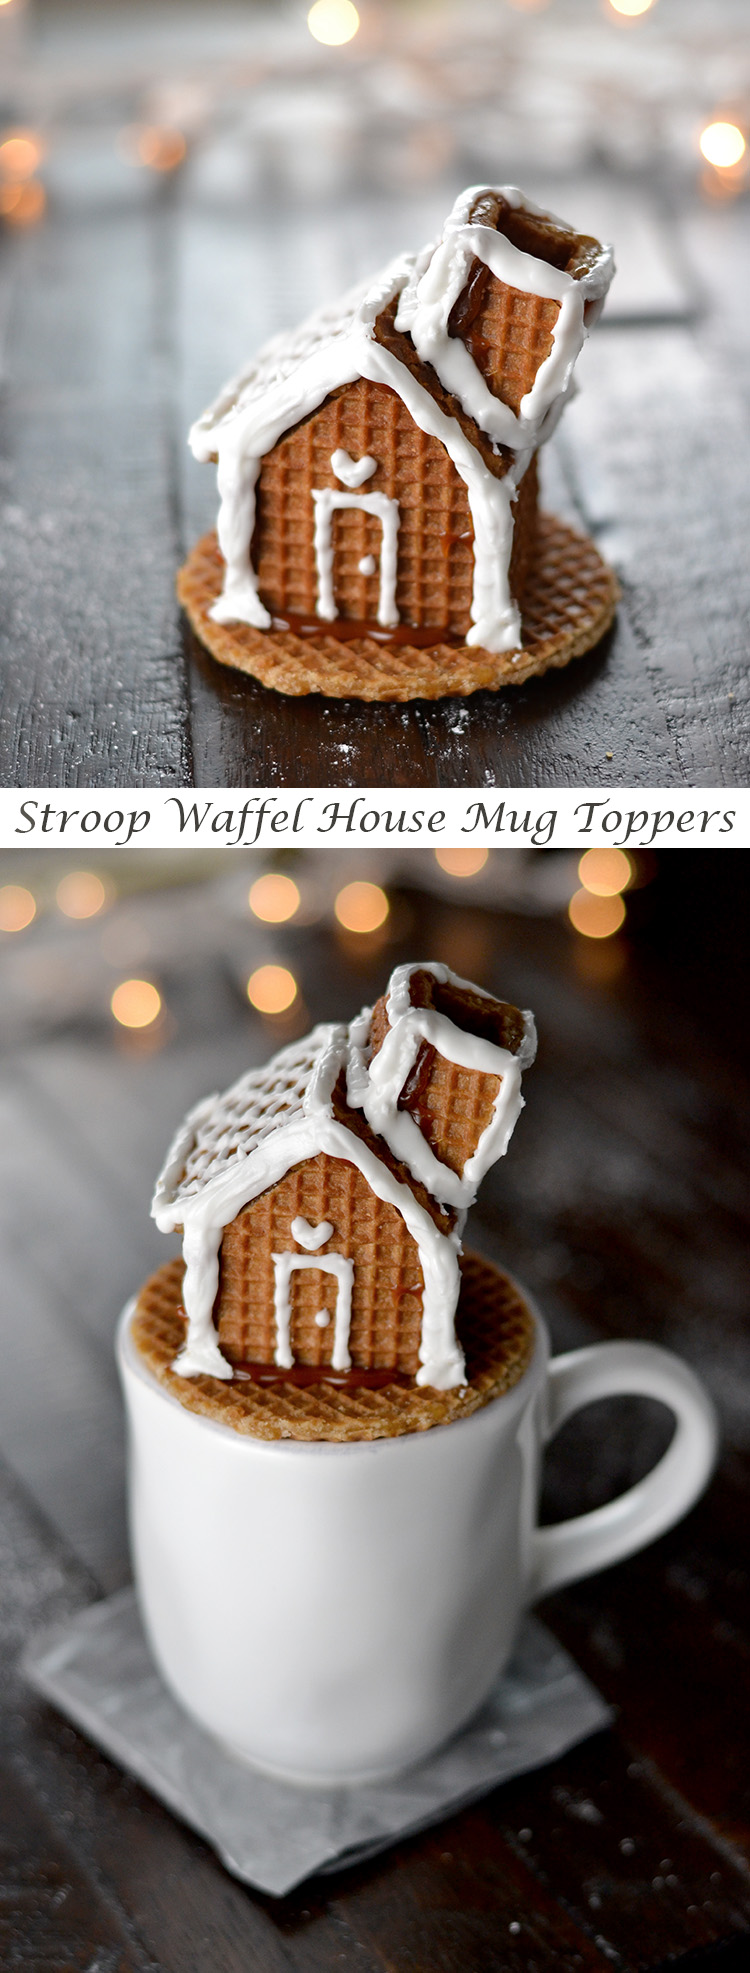 Stroopwafel House Mug Toppers